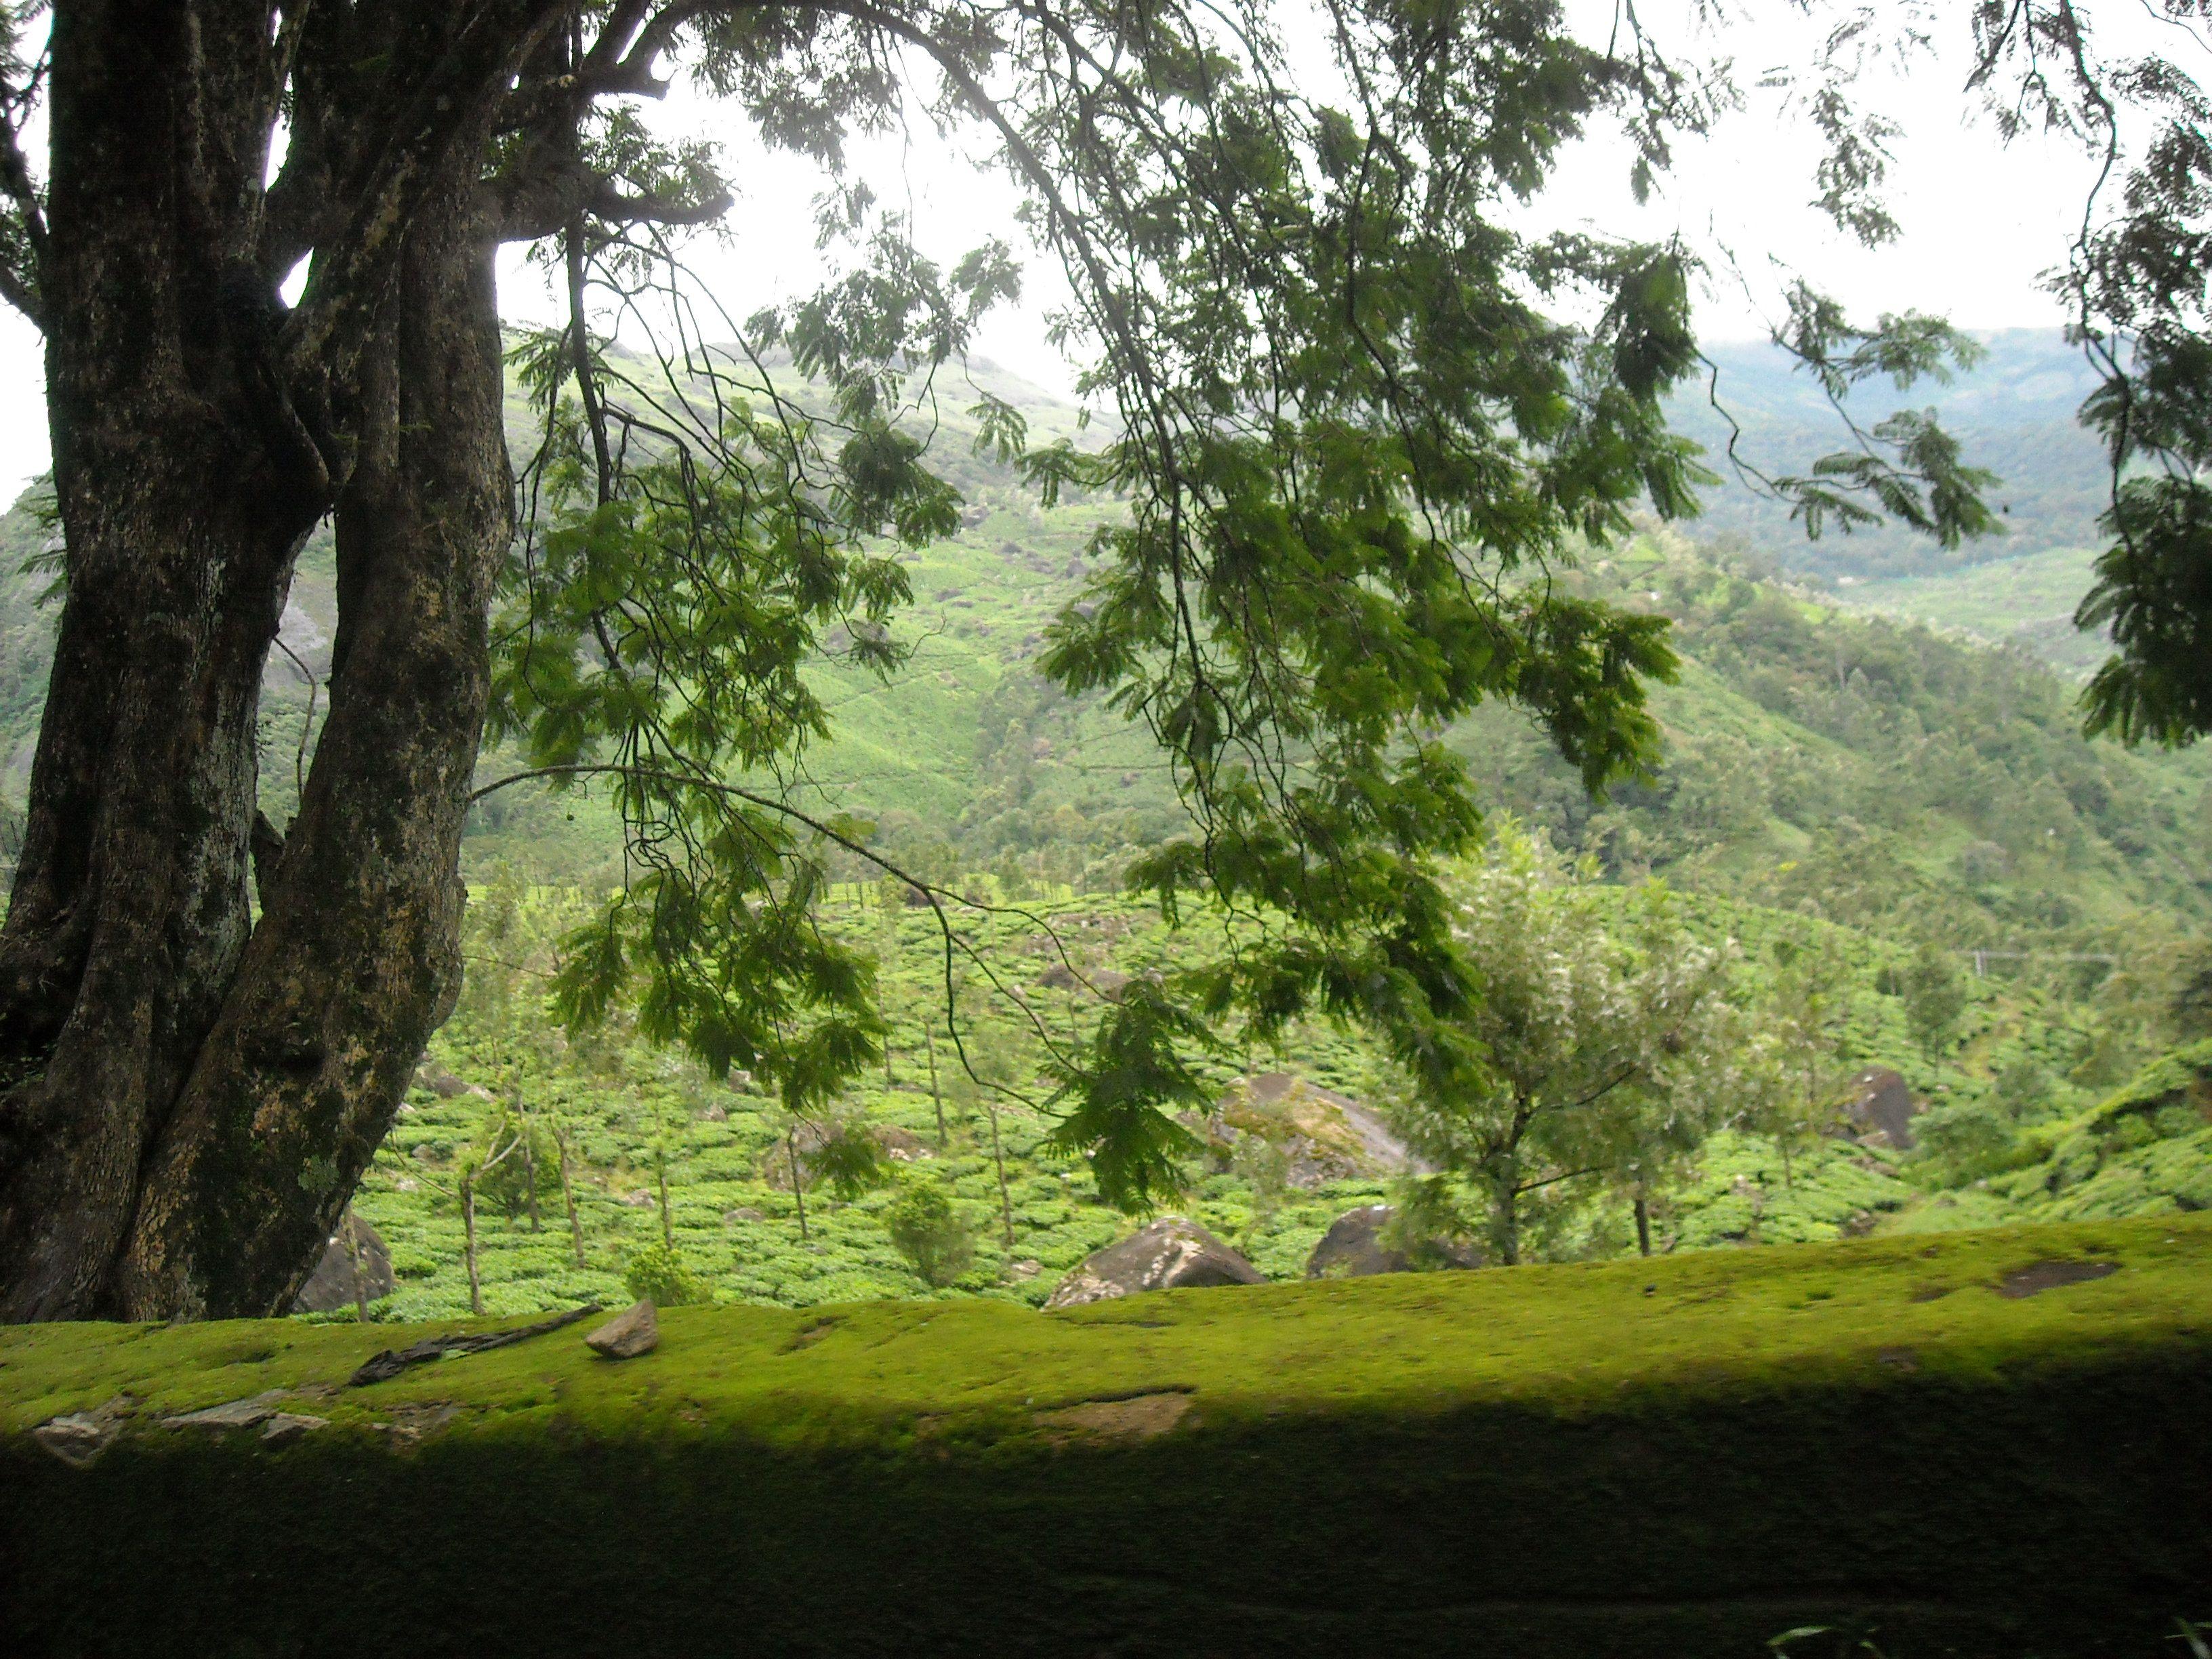 Picturesque Kerala Picturesque, Kerala, Trip